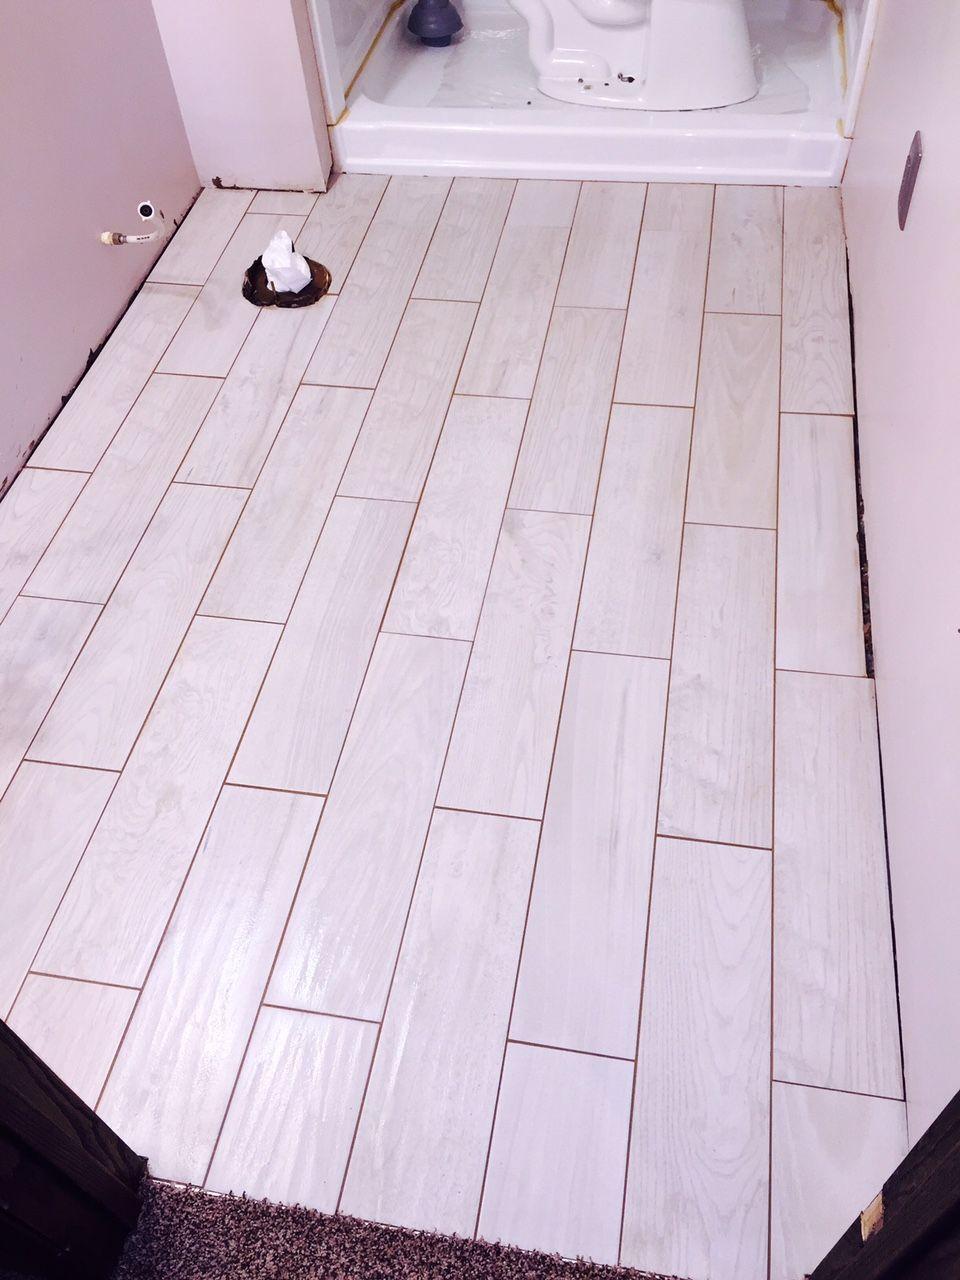 DIY Tile Flooring Installation construction2style